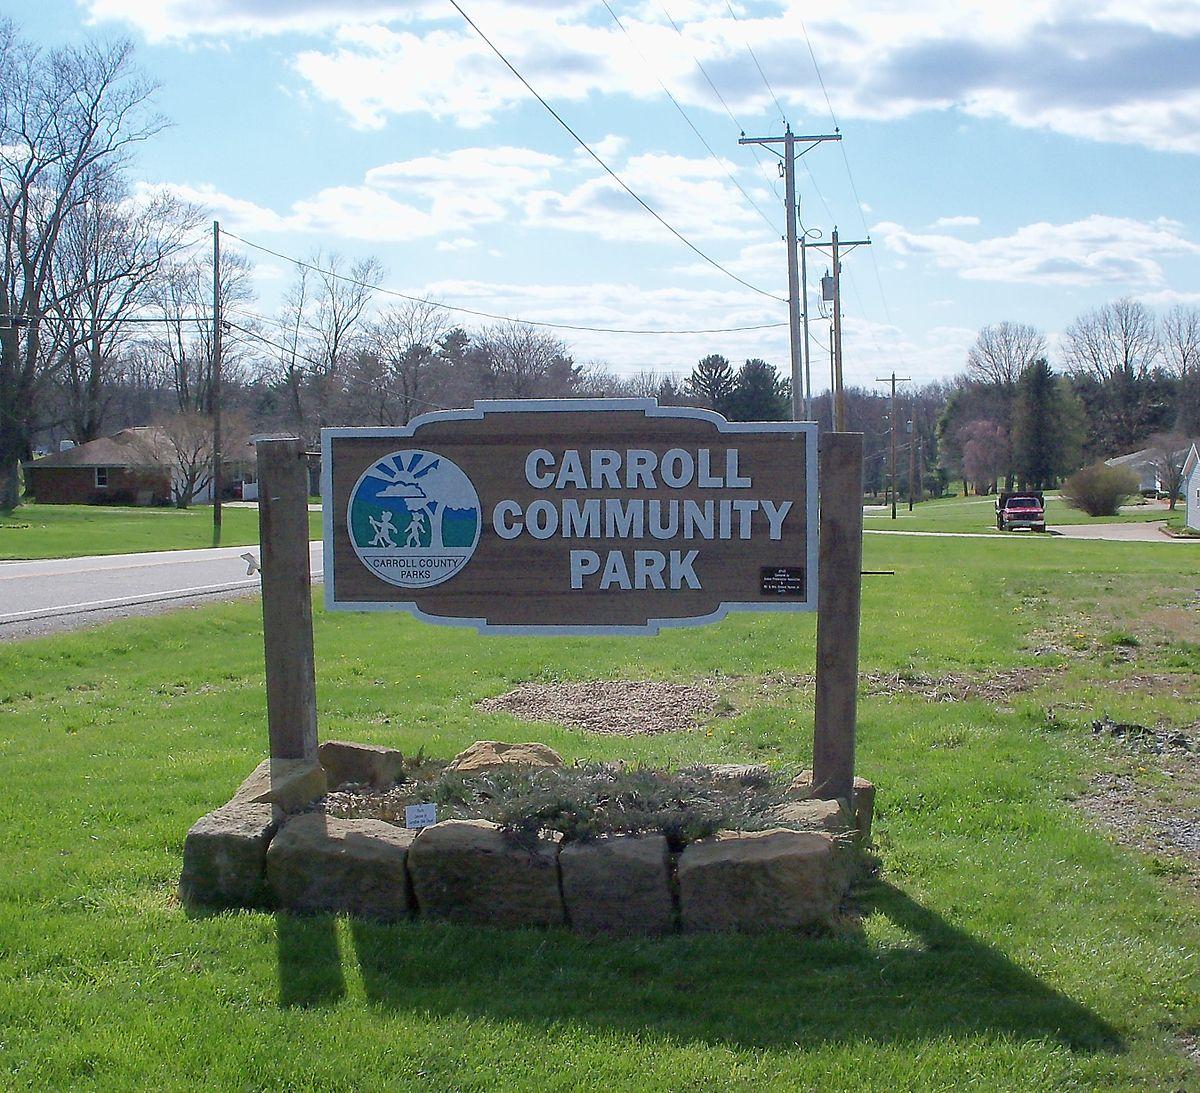 Ohio carroll county sherrodsville - Ohio Carroll County Sherrodsville 18